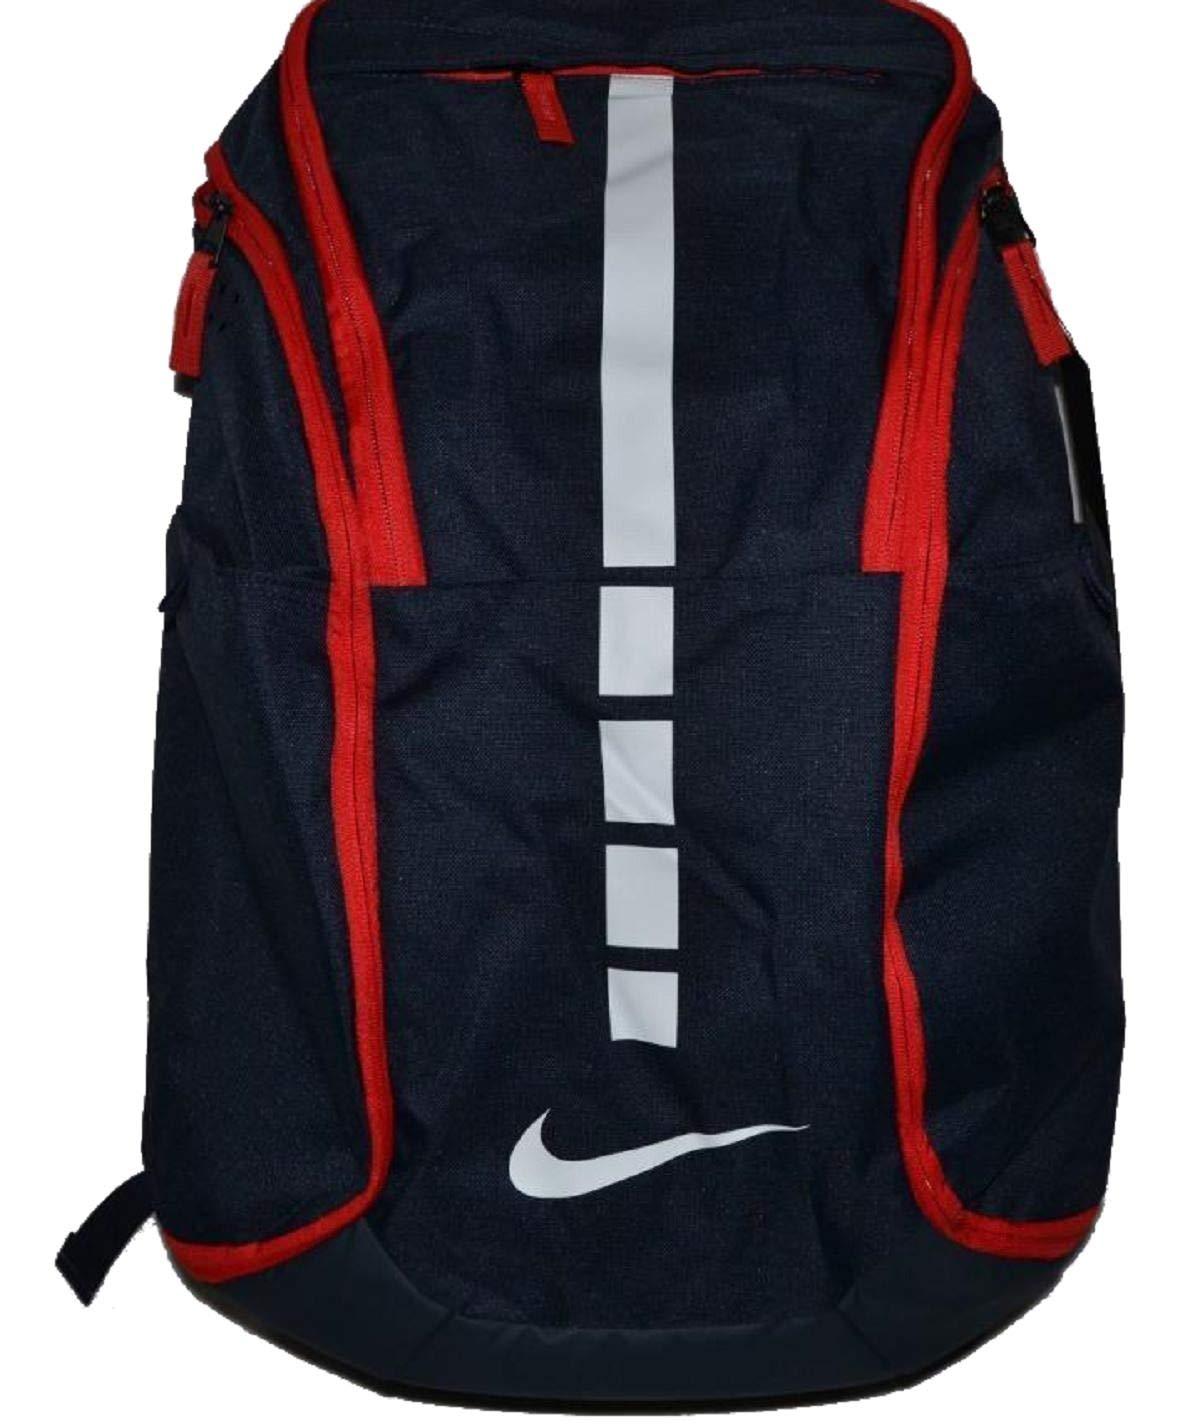 Nike Hoops Elite Hoops Pro Basketball Backpack Obsidian Blue/Red/White